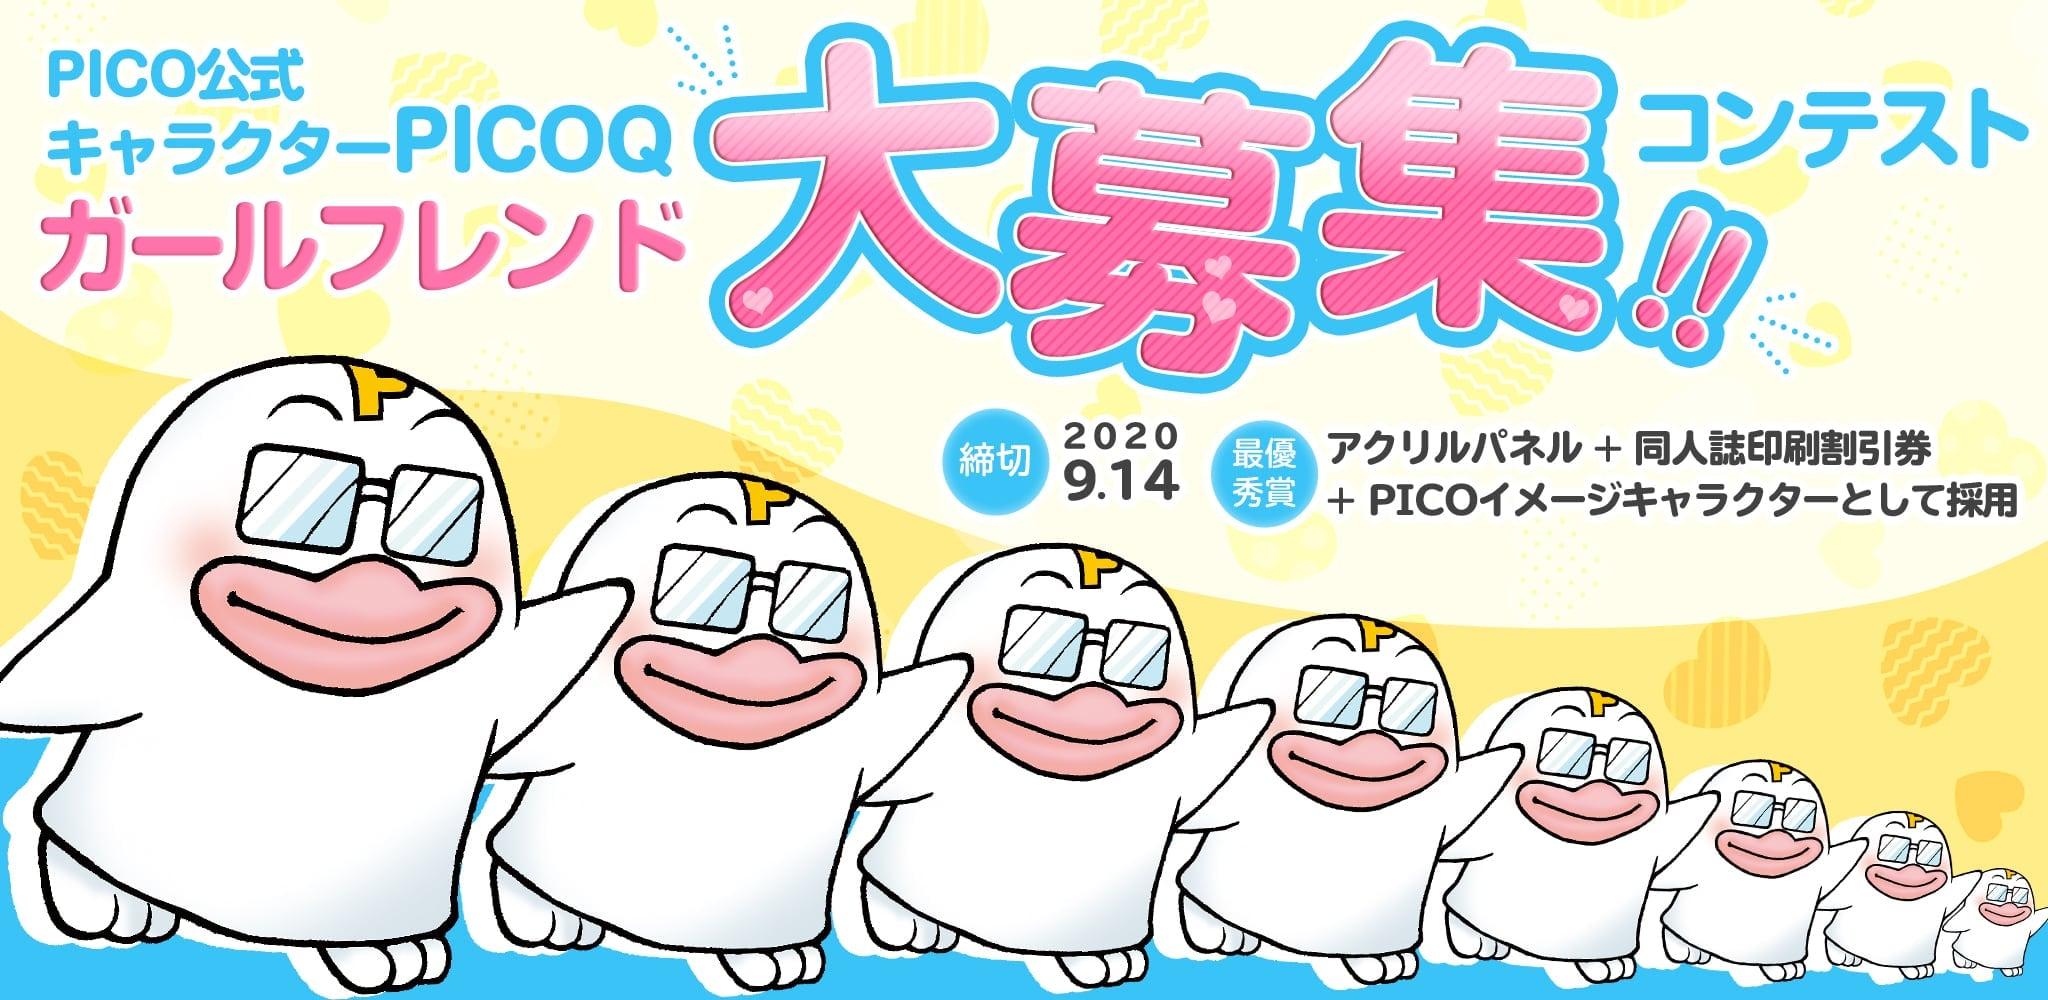 PICO公式キャラクターPICOQガールフレンド大募集!!コンテスト  コンテスト - アートストリート(ART street) by MediBang